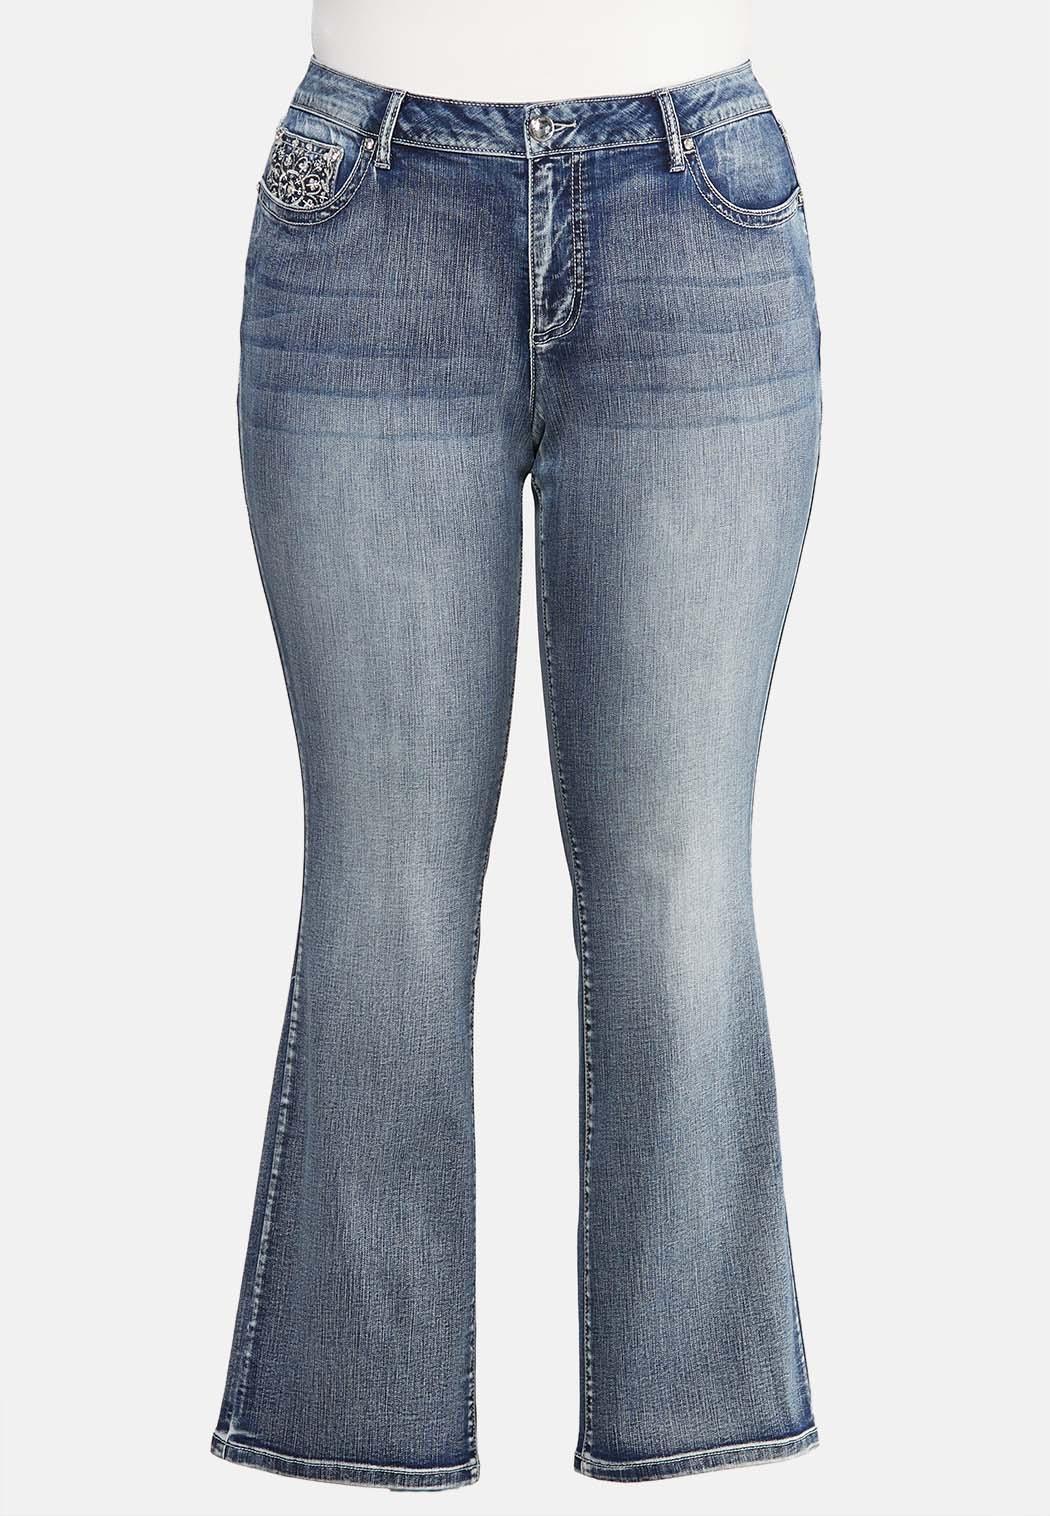 Plus Size Curvy Floral Studded Jeans (Item #43942831)